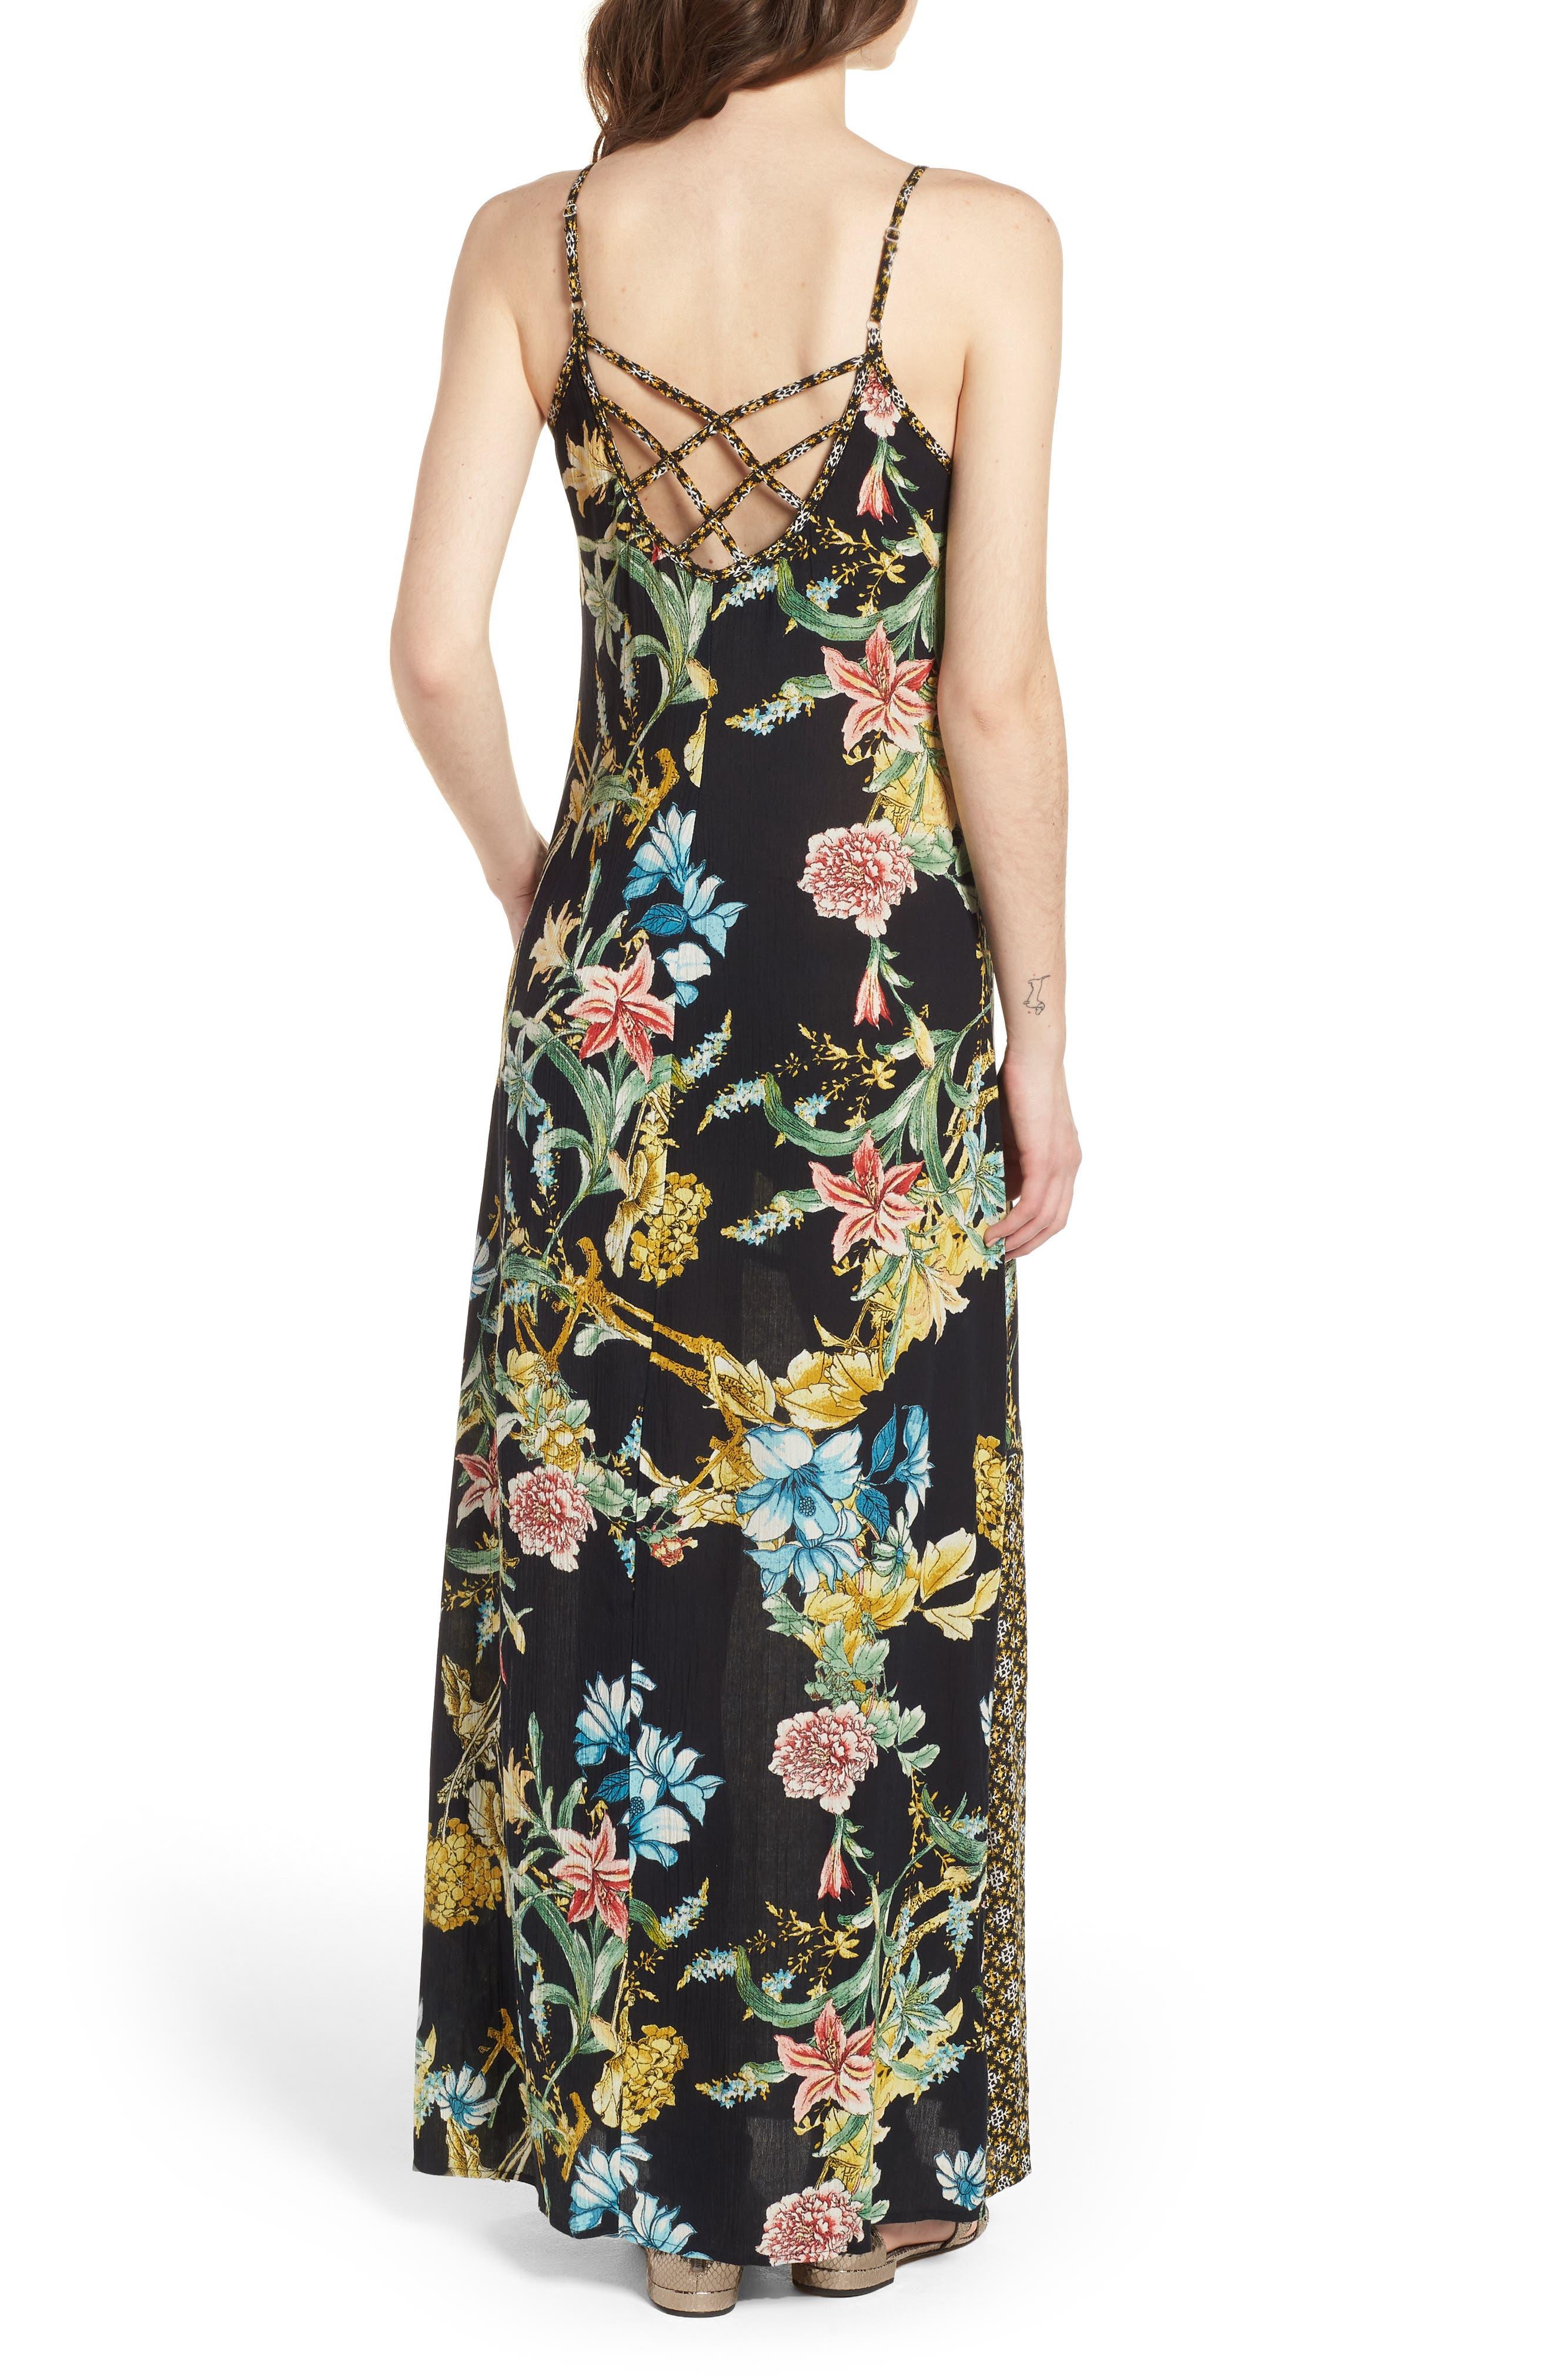 Tropical Mixed Print Maxi Dress,                             Alternate thumbnail 2, color,                             Black/ Yellow